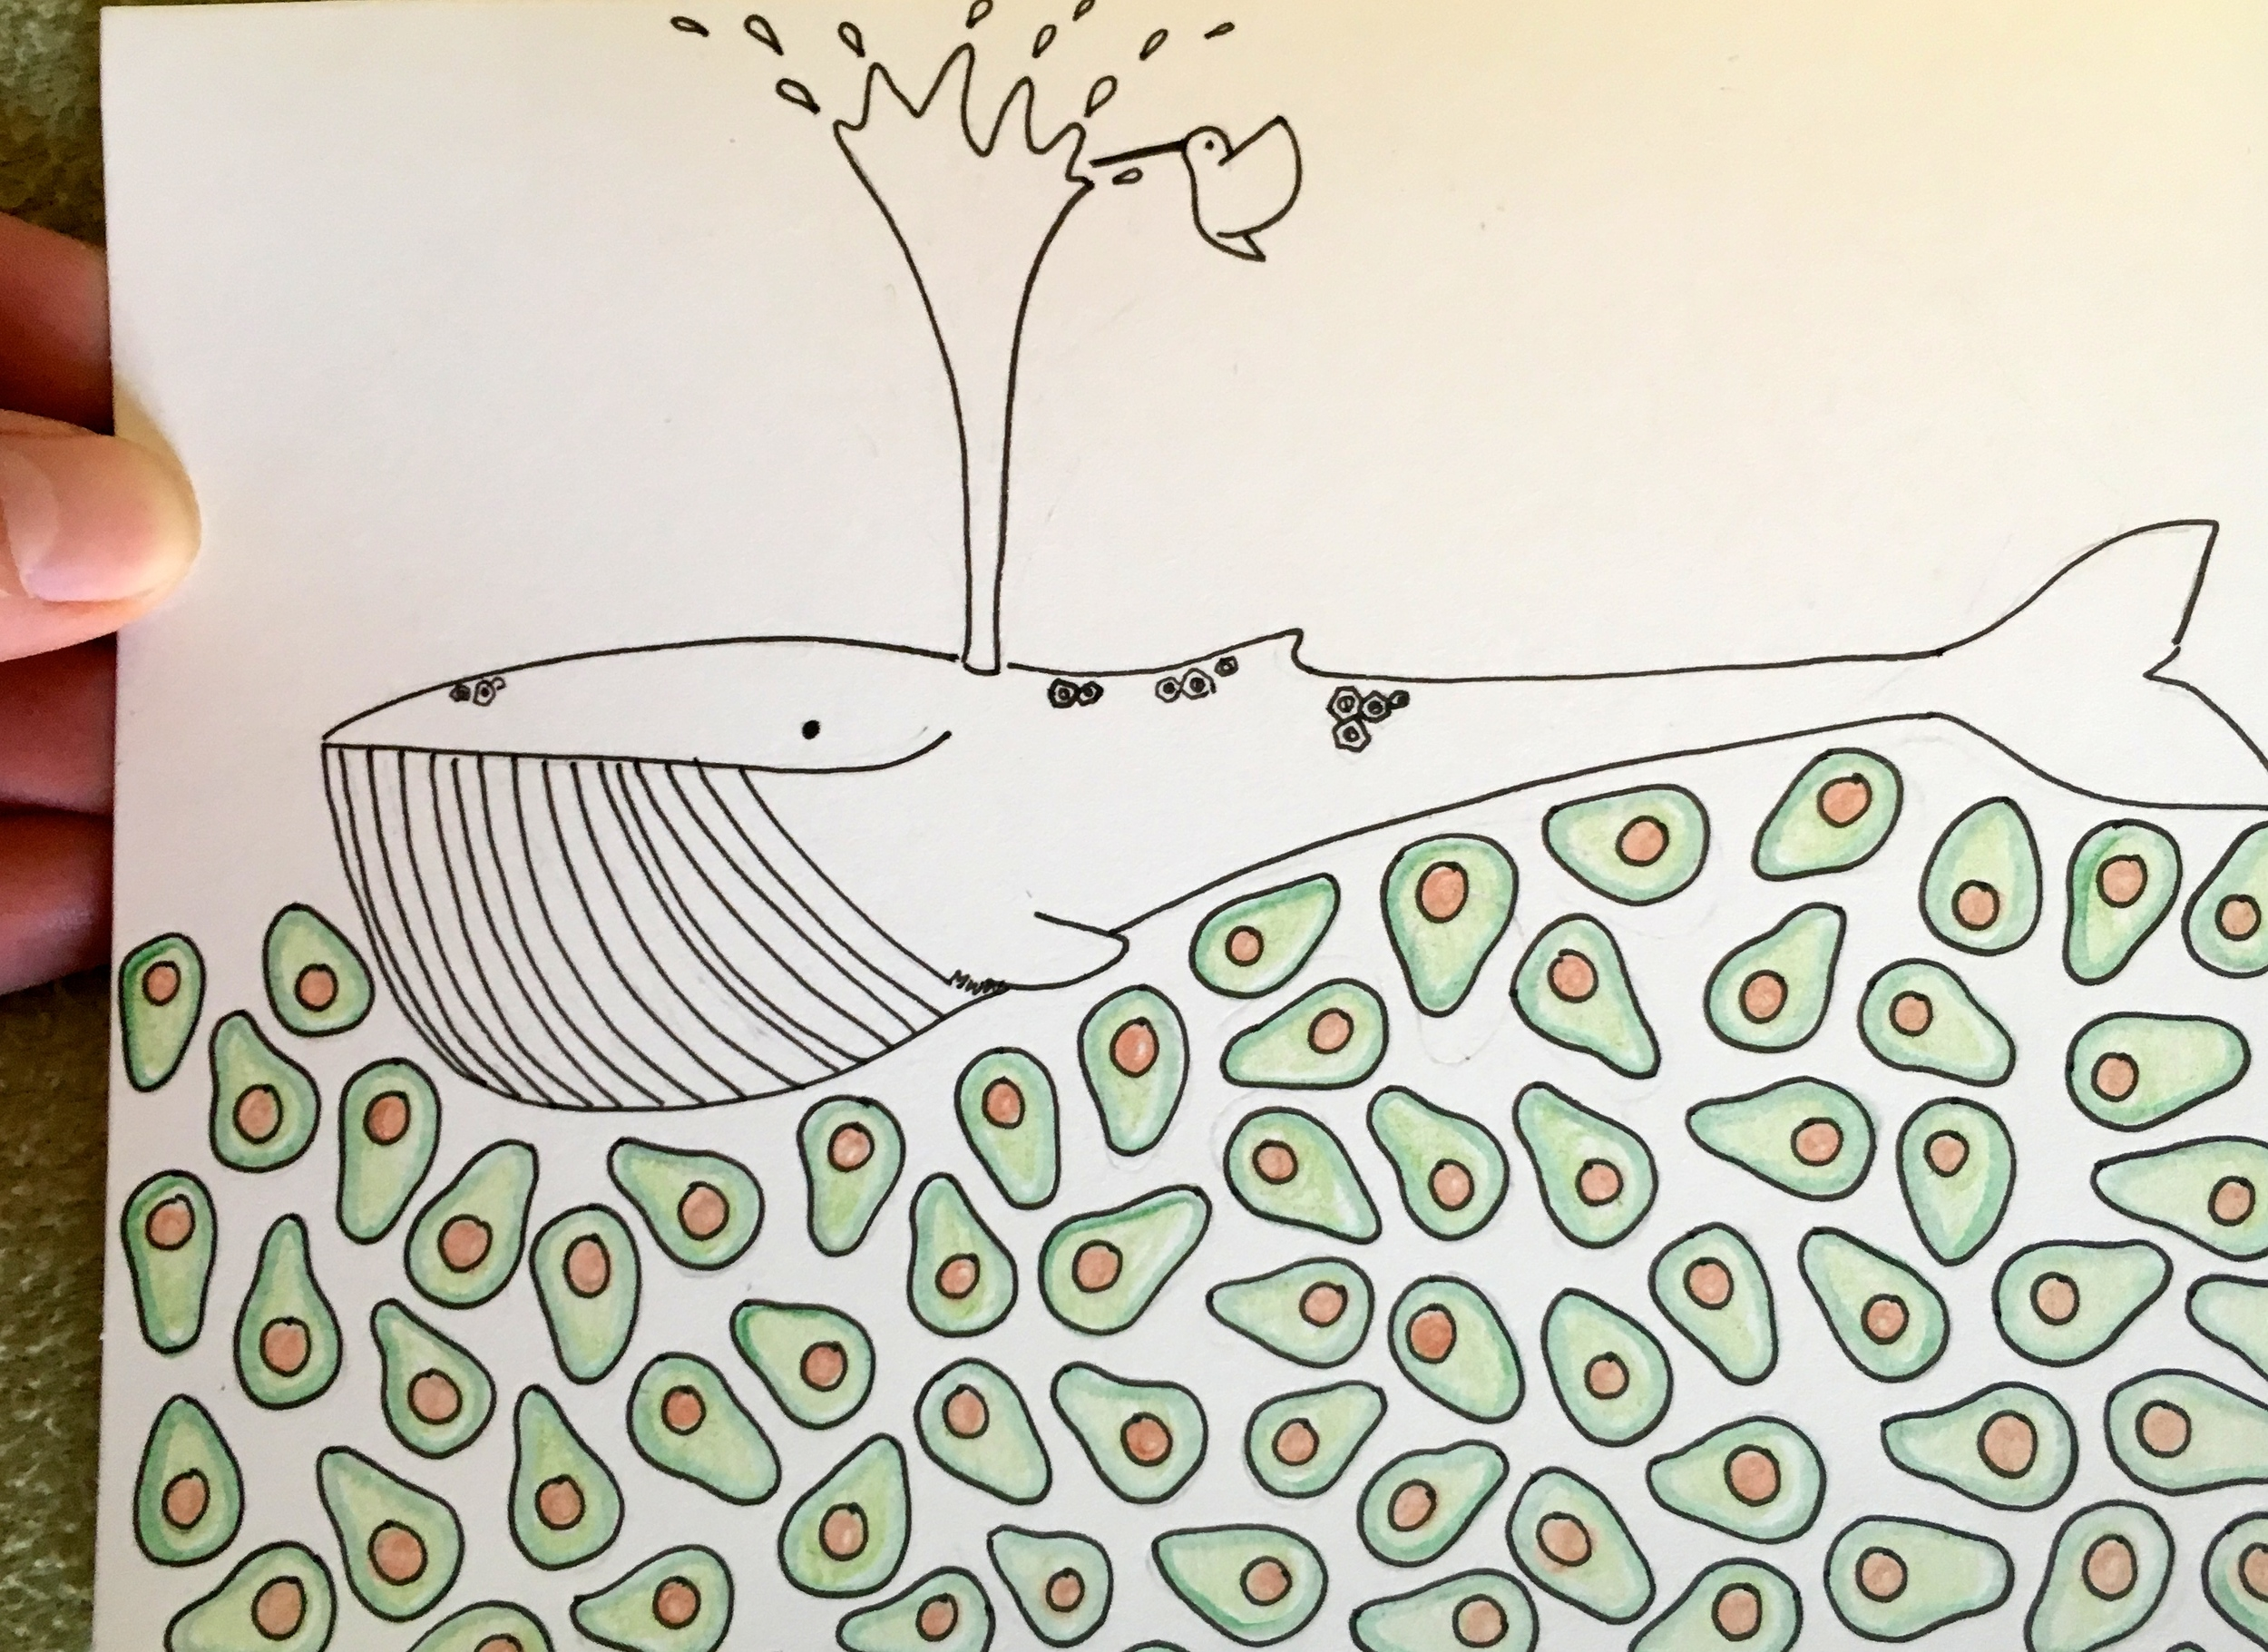 Avocado seas, for Kiya